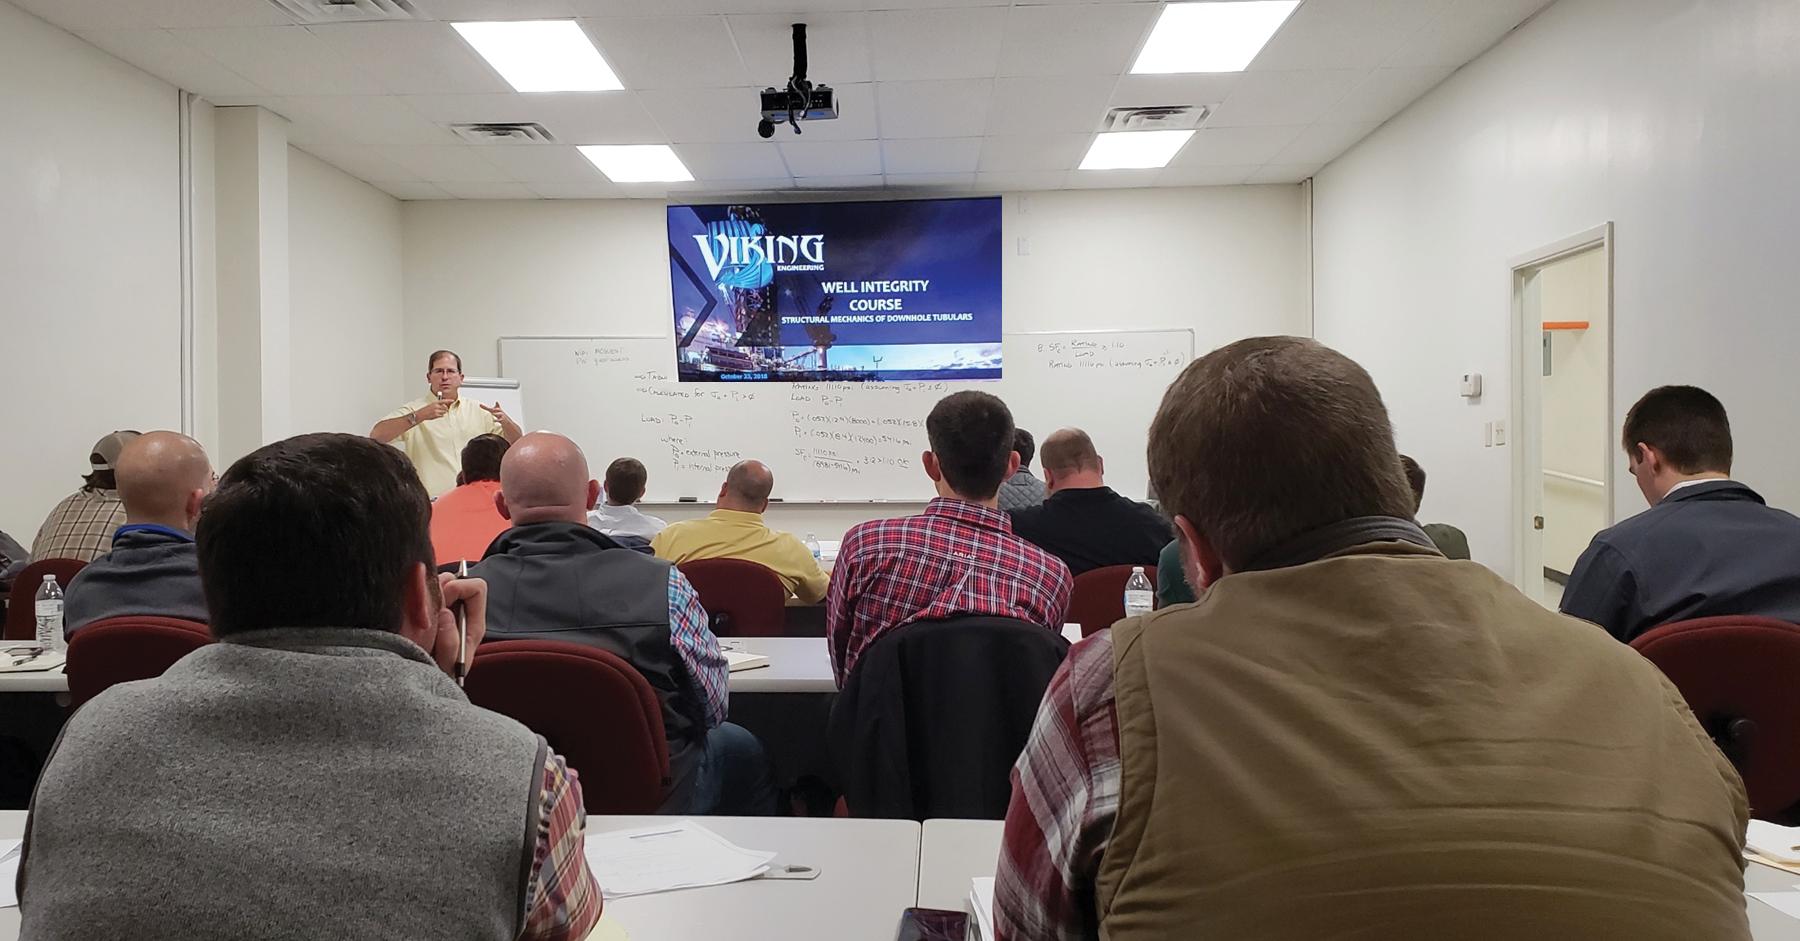 2018 - LinkedIn Update - Viking - Training Pic.jpg